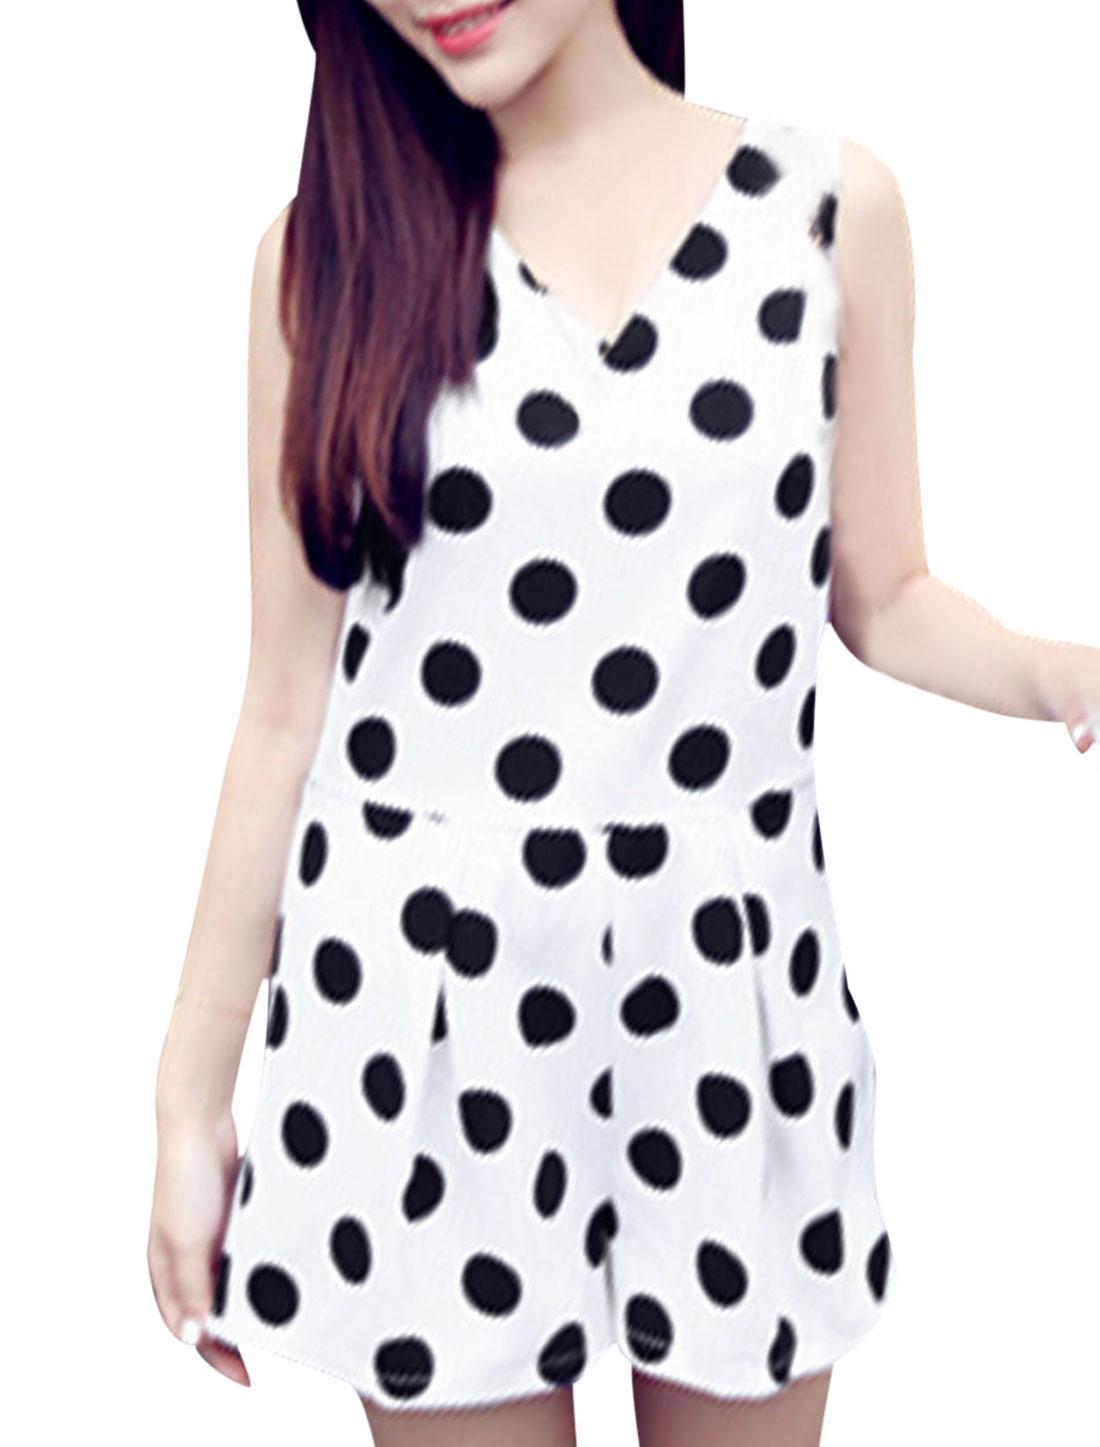 Lady V Neck Concealed Zipper Back Dots Prints Romper White S